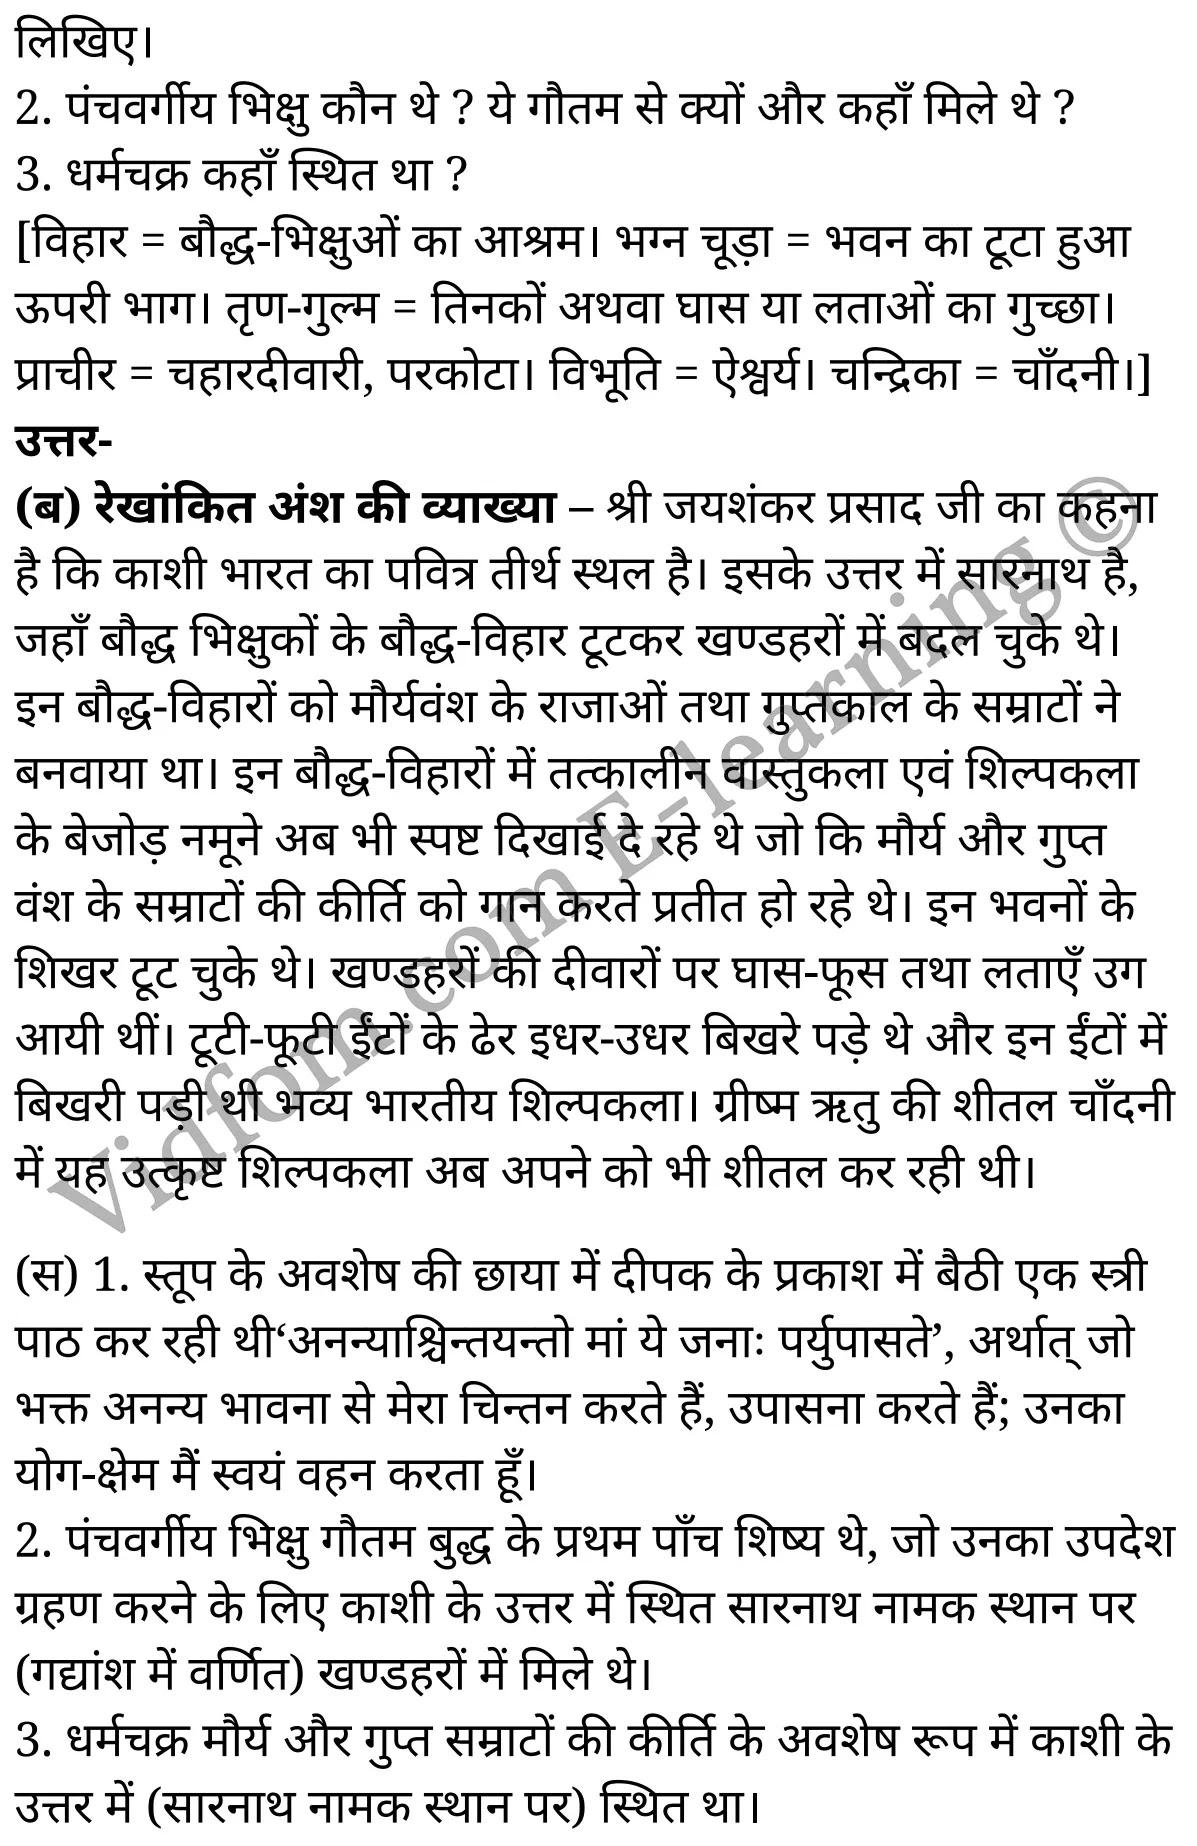 कक्षा 10 हिंदी  के नोट्स  हिंदी में एनसीईआरटी समाधान,     class 10 Hindi Gadya Chapter 2,   class 10 Hindi Gadya Chapter 2 ncert solutions in Hindi,   class 10 Hindi Gadya Chapter 2 notes in hindi,   class 10 Hindi Gadya Chapter 2 question answer,   class 10 Hindi Gadya Chapter 2 notes,   class 10 Hindi Gadya Chapter 2 class 10 Hindi Gadya Chapter 2 in  hindi,    class 10 Hindi Gadya Chapter 2 important questions in  hindi,   class 10 Hindi Gadya Chapter 2 notes in hindi,    class 10 Hindi Gadya Chapter 2 test,   class 10 Hindi Gadya Chapter 2 pdf,   class 10 Hindi Gadya Chapter 2 notes pdf,   class 10 Hindi Gadya Chapter 2 exercise solutions,   class 10 Hindi Gadya Chapter 2 notes study rankers,   class 10 Hindi Gadya Chapter 2 notes,    class 10 Hindi Gadya Chapter 2  class 10  notes pdf,   class 10 Hindi Gadya Chapter 2 class 10  notes  ncert,   class 10 Hindi Gadya Chapter 2 class 10 pdf,   class 10 Hindi Gadya Chapter 2  book,   class 10 Hindi Gadya Chapter 2 quiz class 10  ,   कक्षा 10 ममता,  कक्षा 10 ममता  के नोट्स हिंदी में,  कक्षा 10 ममता प्रश्न उत्तर,  कक्षा 10 ममता के नोट्स,  10 कक्षा ममता  हिंदी में, कक्षा 10 ममता  हिंदी में,  कक्षा 10 ममता  महत्वपूर्ण प्रश्न हिंदी में, कक्षा 10 हिंदी के नोट्स  हिंदी में, ममता हिंदी में कक्षा 10 नोट्स pdf,    ममता हिंदी में  कक्षा 10 नोट्स 2021 ncert,   ममता हिंदी  कक्षा 10 pdf,   ममता हिंदी में  पुस्तक,   ममता हिंदी में की बुक,   ममता हिंदी में  प्रश्नोत्तरी class 10 ,  10   वीं ममता  पुस्तक up board,   बिहार बोर्ड 10  पुस्तक वीं ममता नोट्स,    ममता  कक्षा 10 नोट्स 2021 ncert,   ममता  कक्षा 10 pdf,   ममता  पुस्तक,   ममता की बुक,   ममता प्रश्नोत्तरी class 10,   10  th class 10 Hindi Gadya Chapter 2  book up board,   up board 10  th class 10 Hindi Gadya Chapter 2 notes,  class 10 Hindi,   class 10 Hindi ncert solutions in Hindi,   class 10 Hindi notes in hindi,   class 10 Hindi question answer,   class 10 Hindi notes,  class 10 Hindi class 10 Hindi Gadya Chapter 2 in  hindi,    class 10 Hindi important questions in  hindi